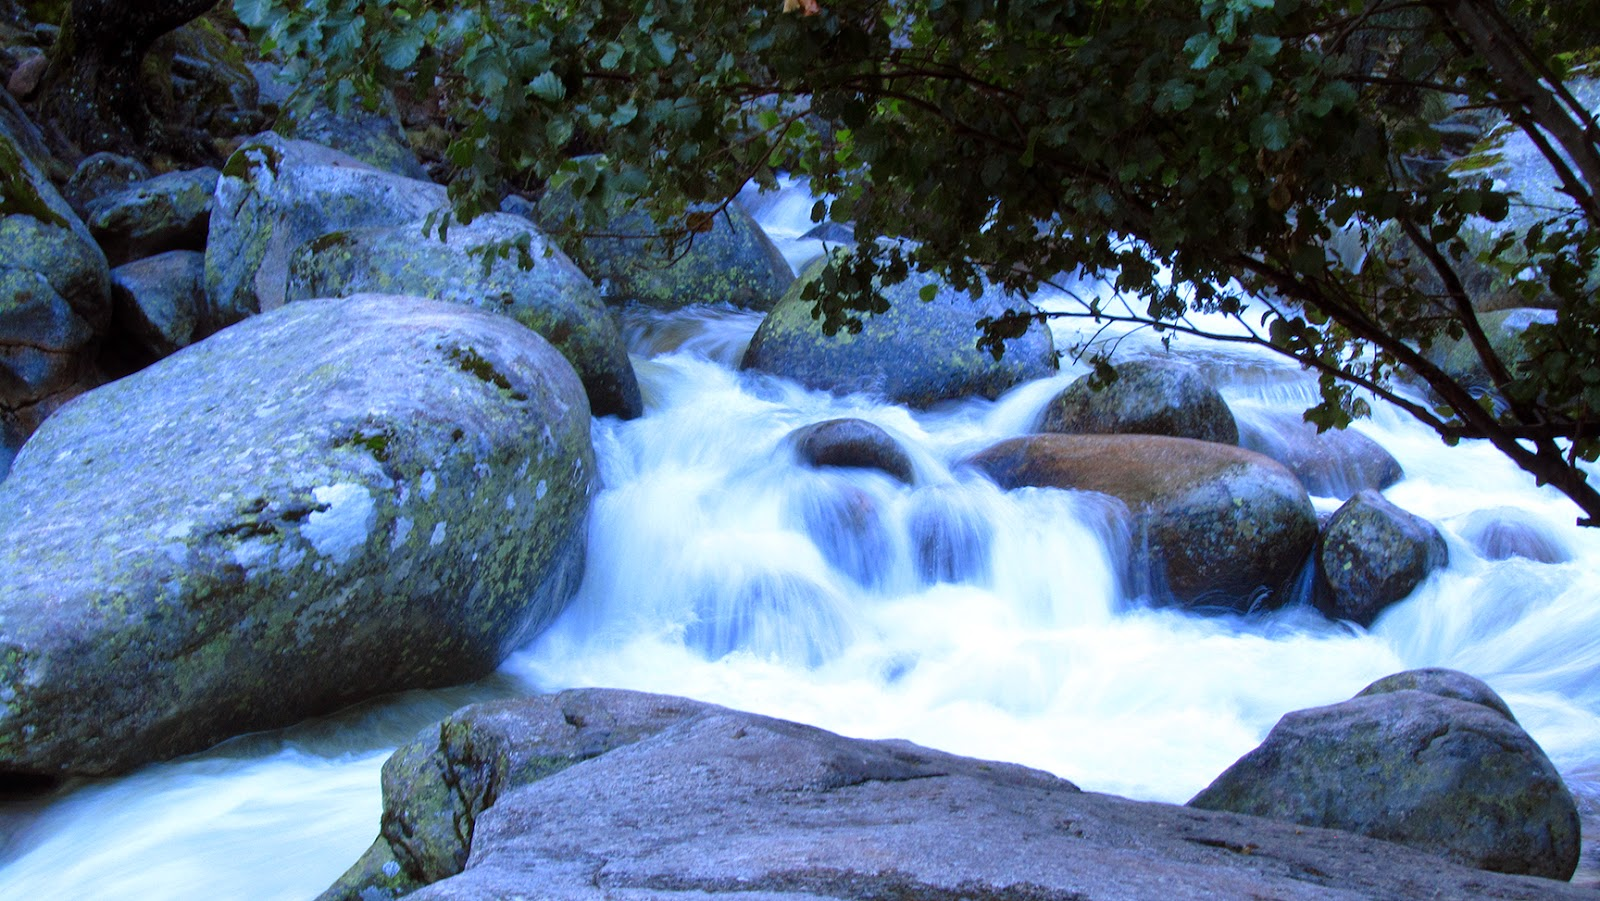 Valle del Jerte - Río